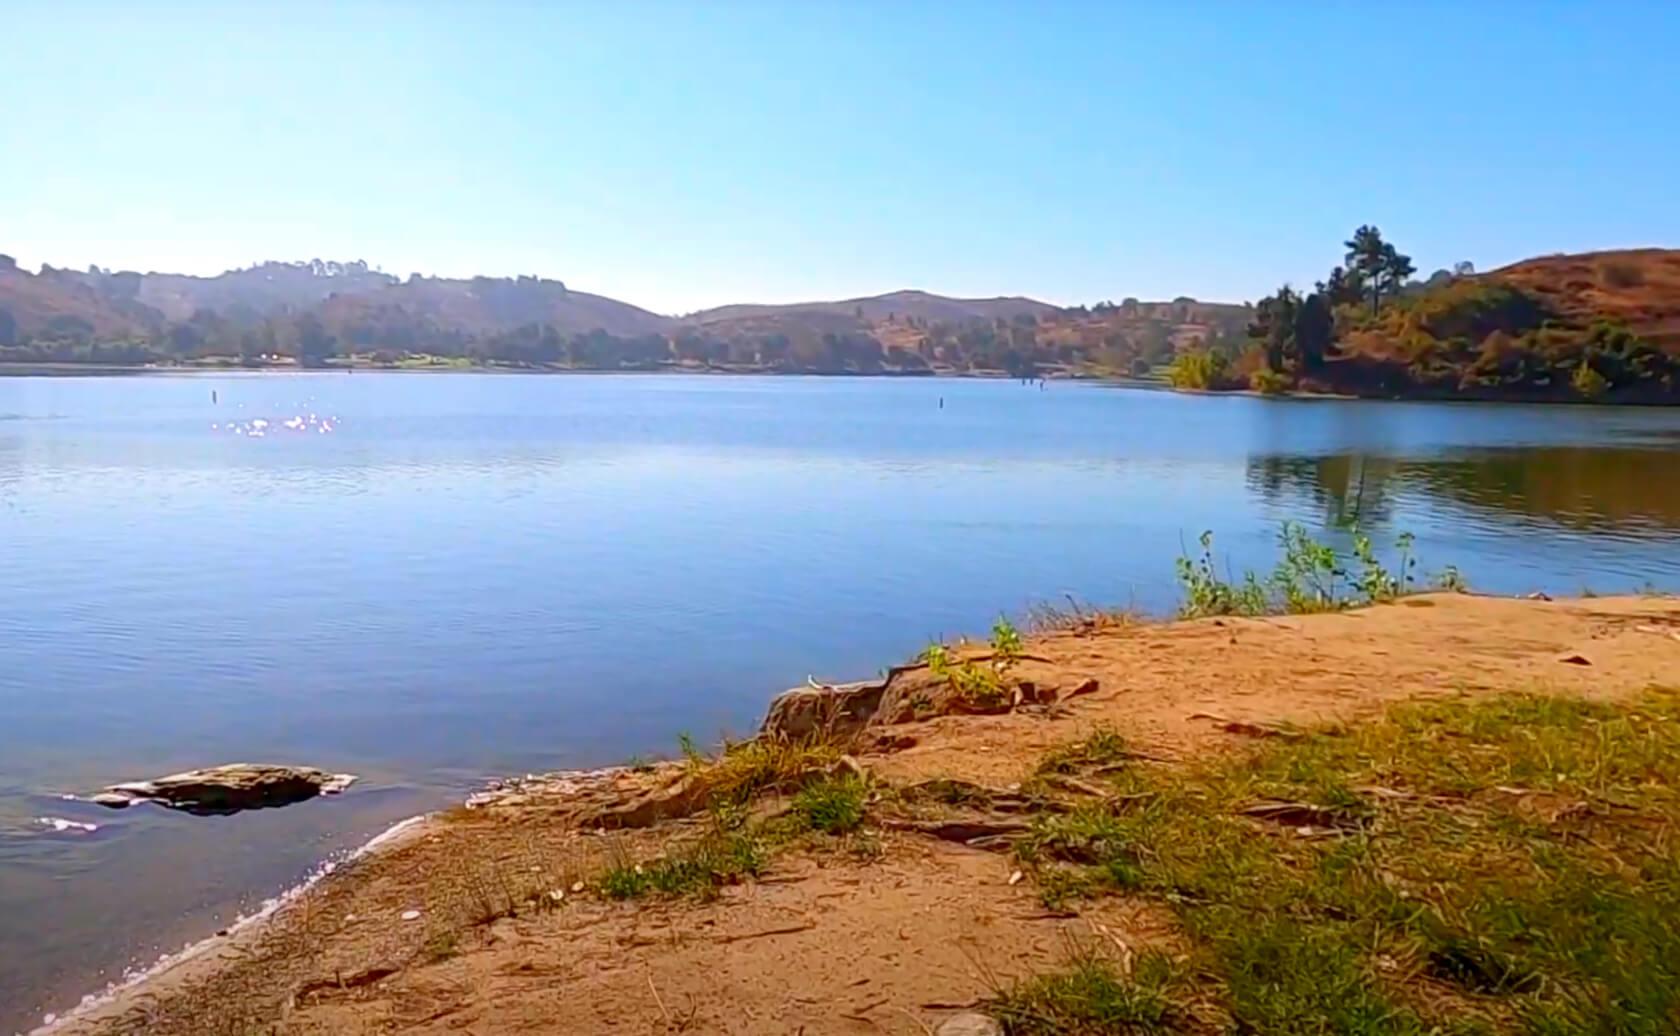 Puddingstone-Lake-Fishing-Guide-Report-California-05